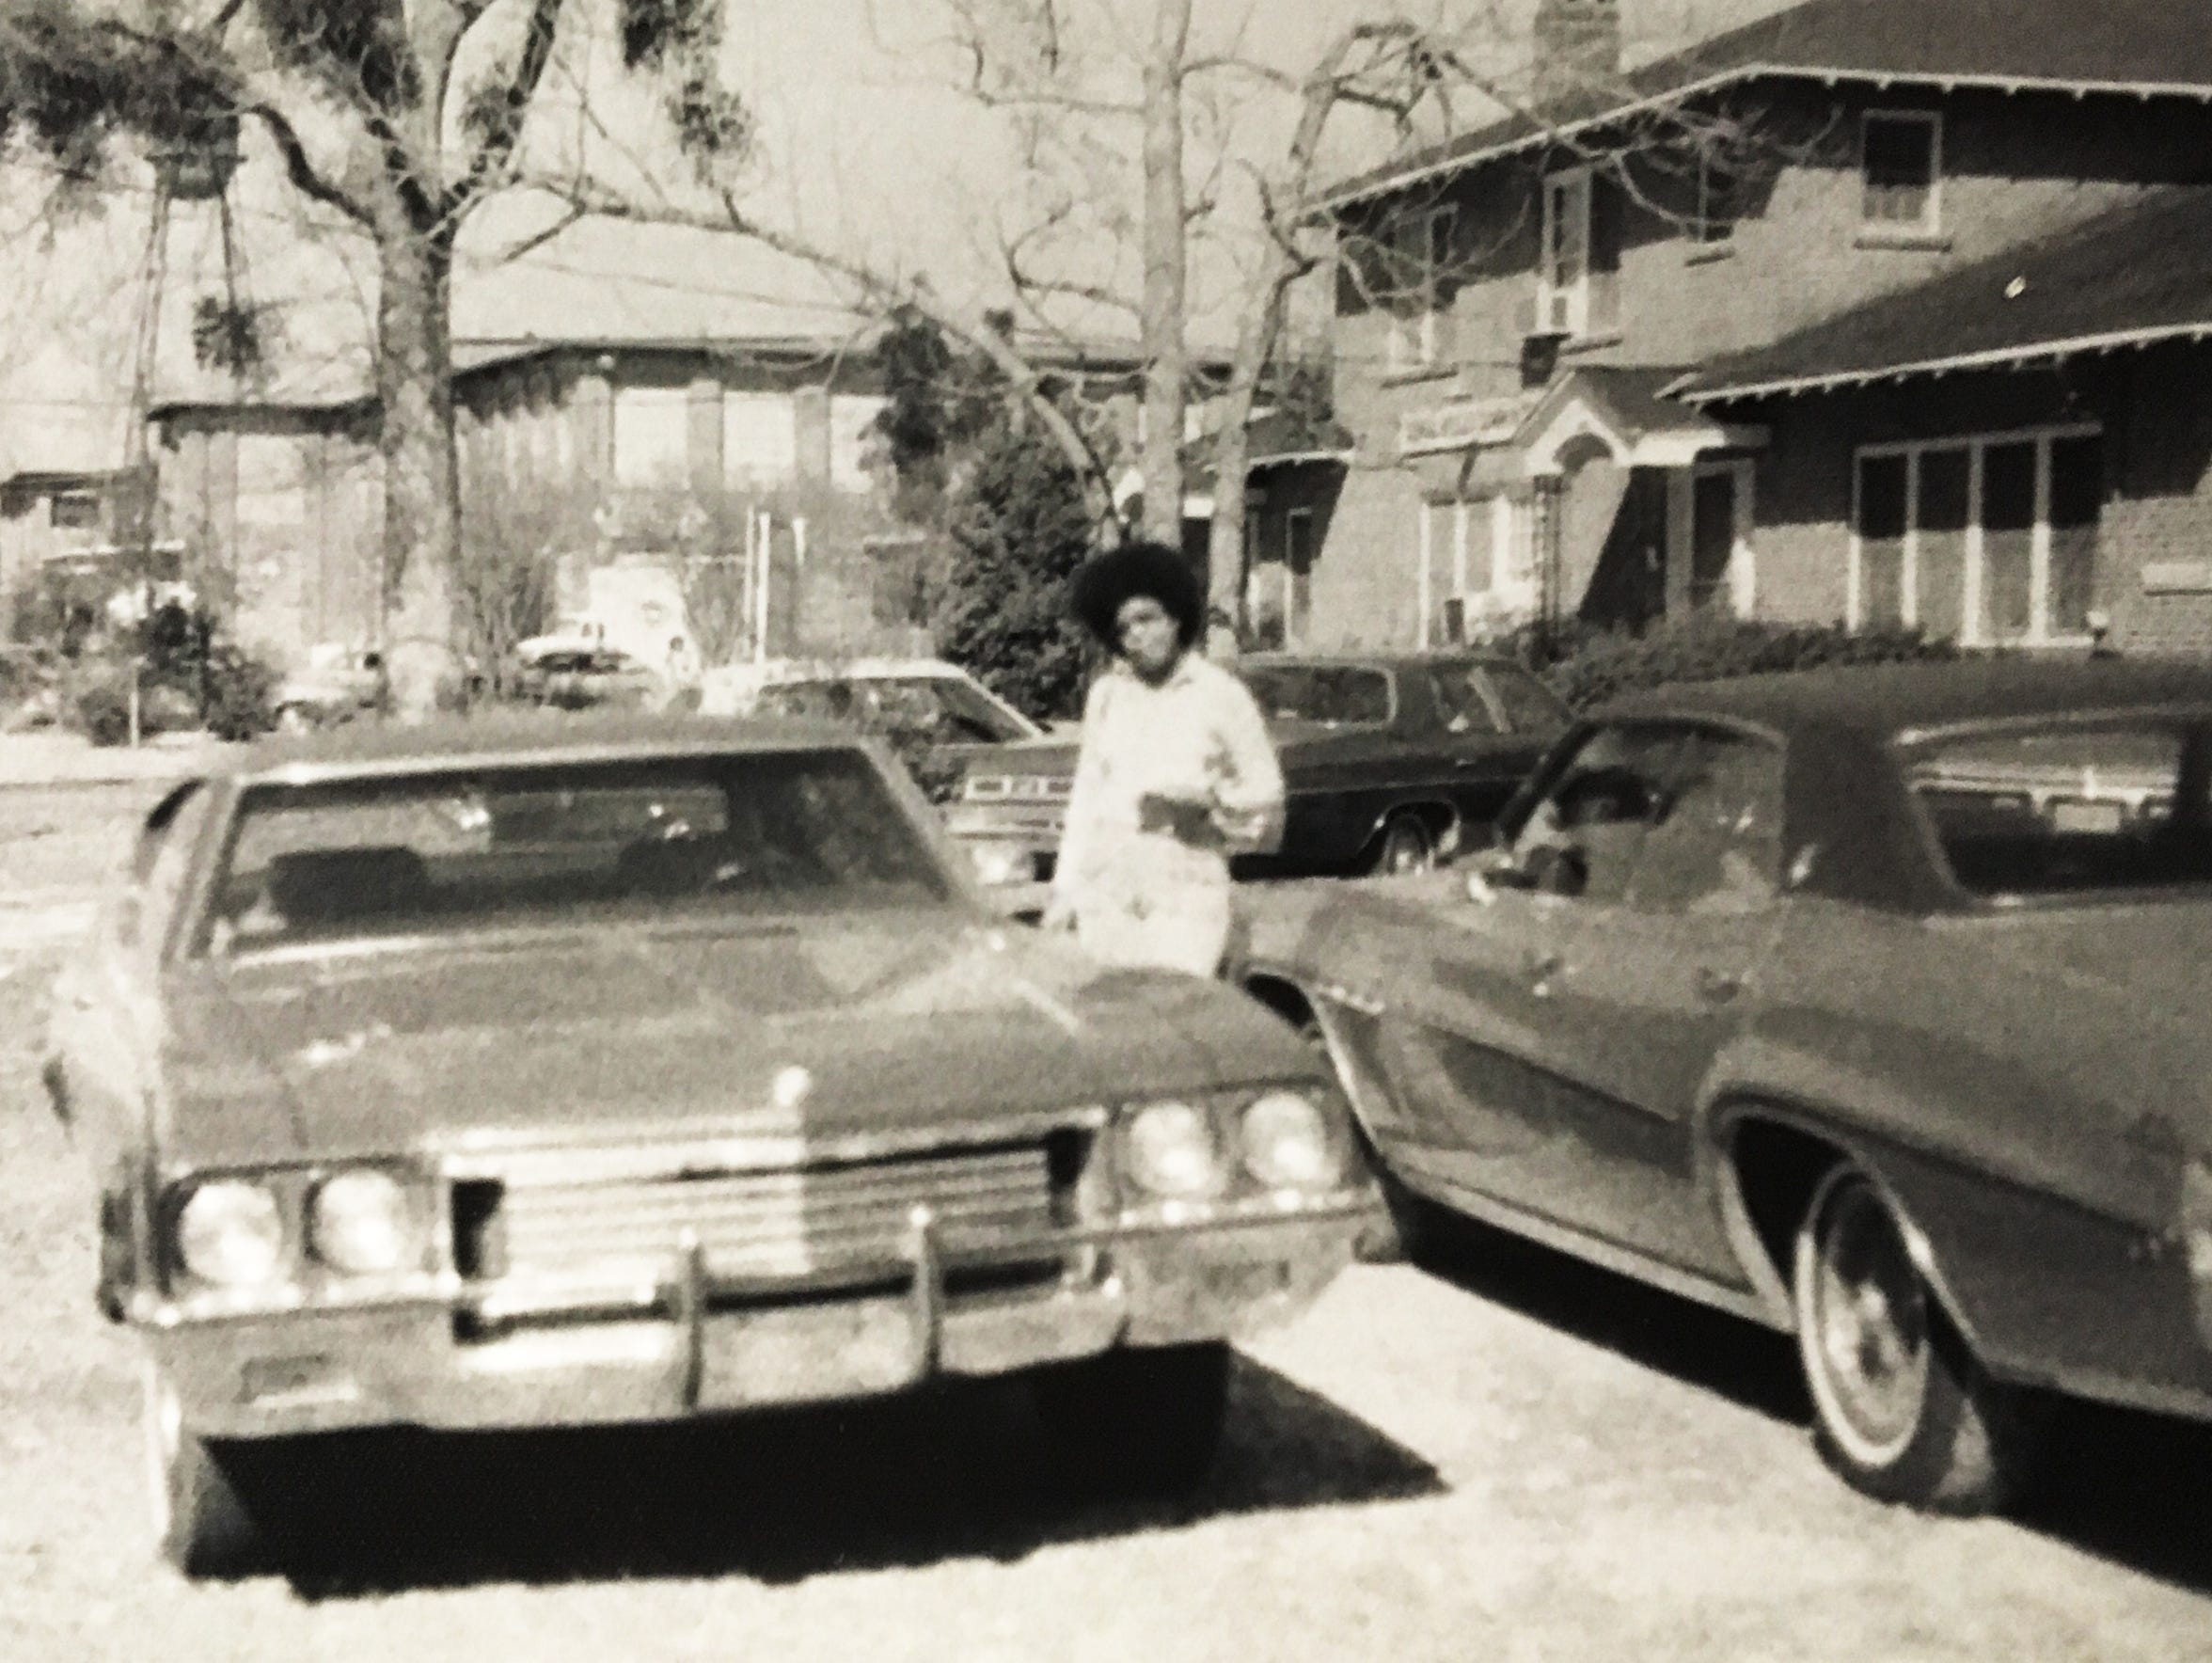 Clara Ester in Mobile in 1970 in impoverished Crichton